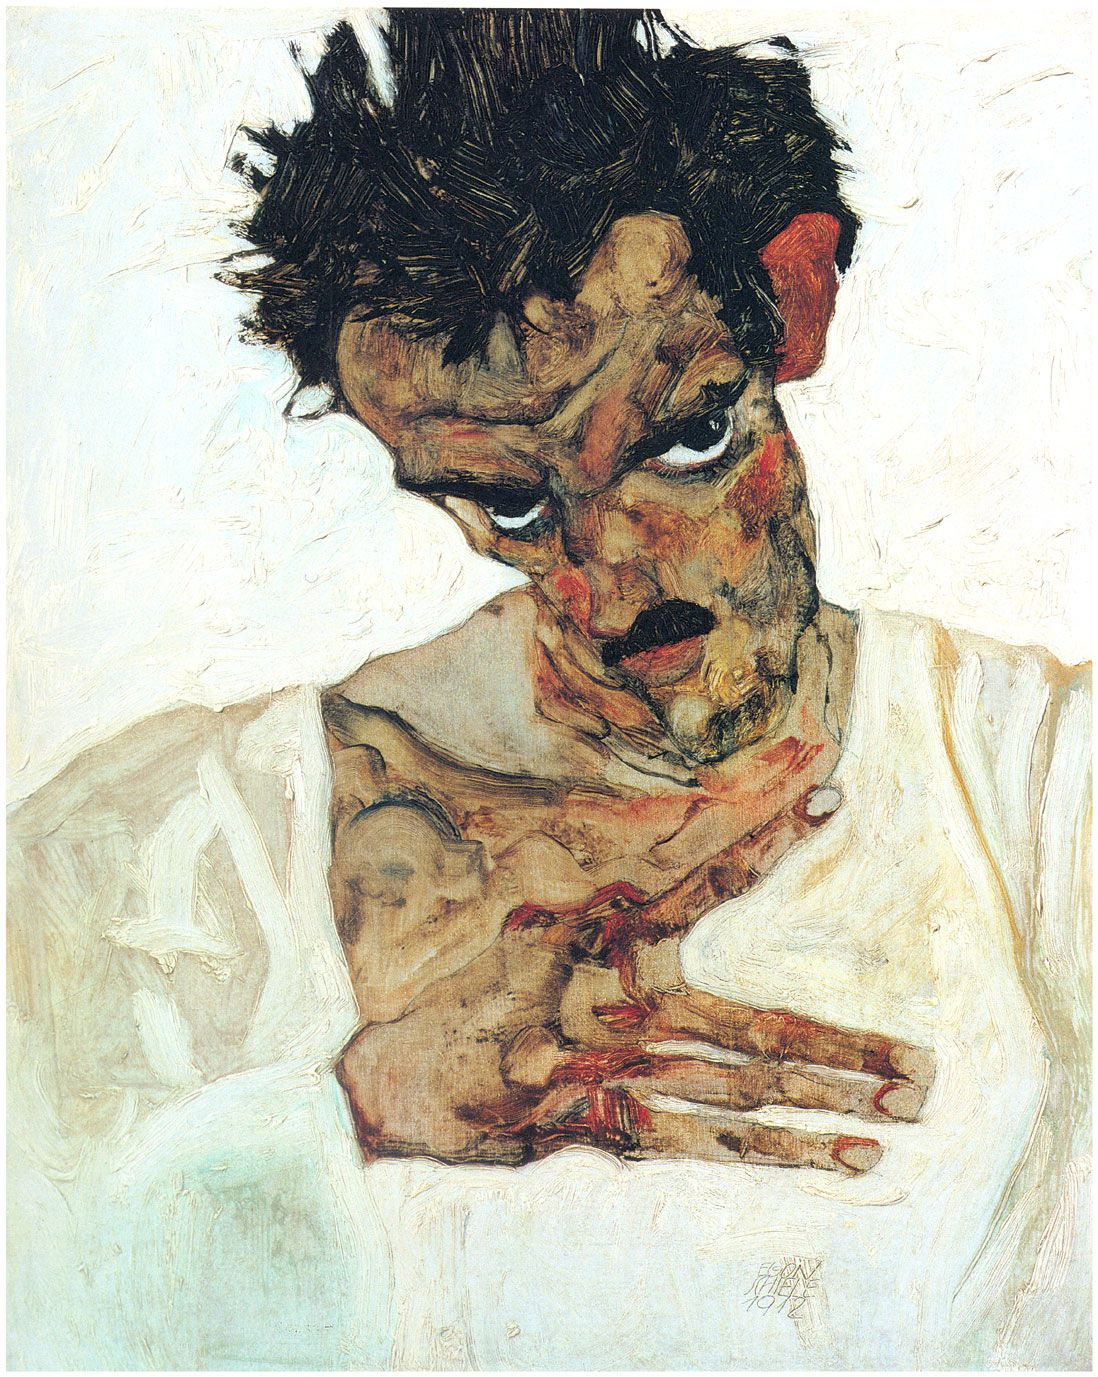 Egon Schiele. Self-portrait with her head bowed